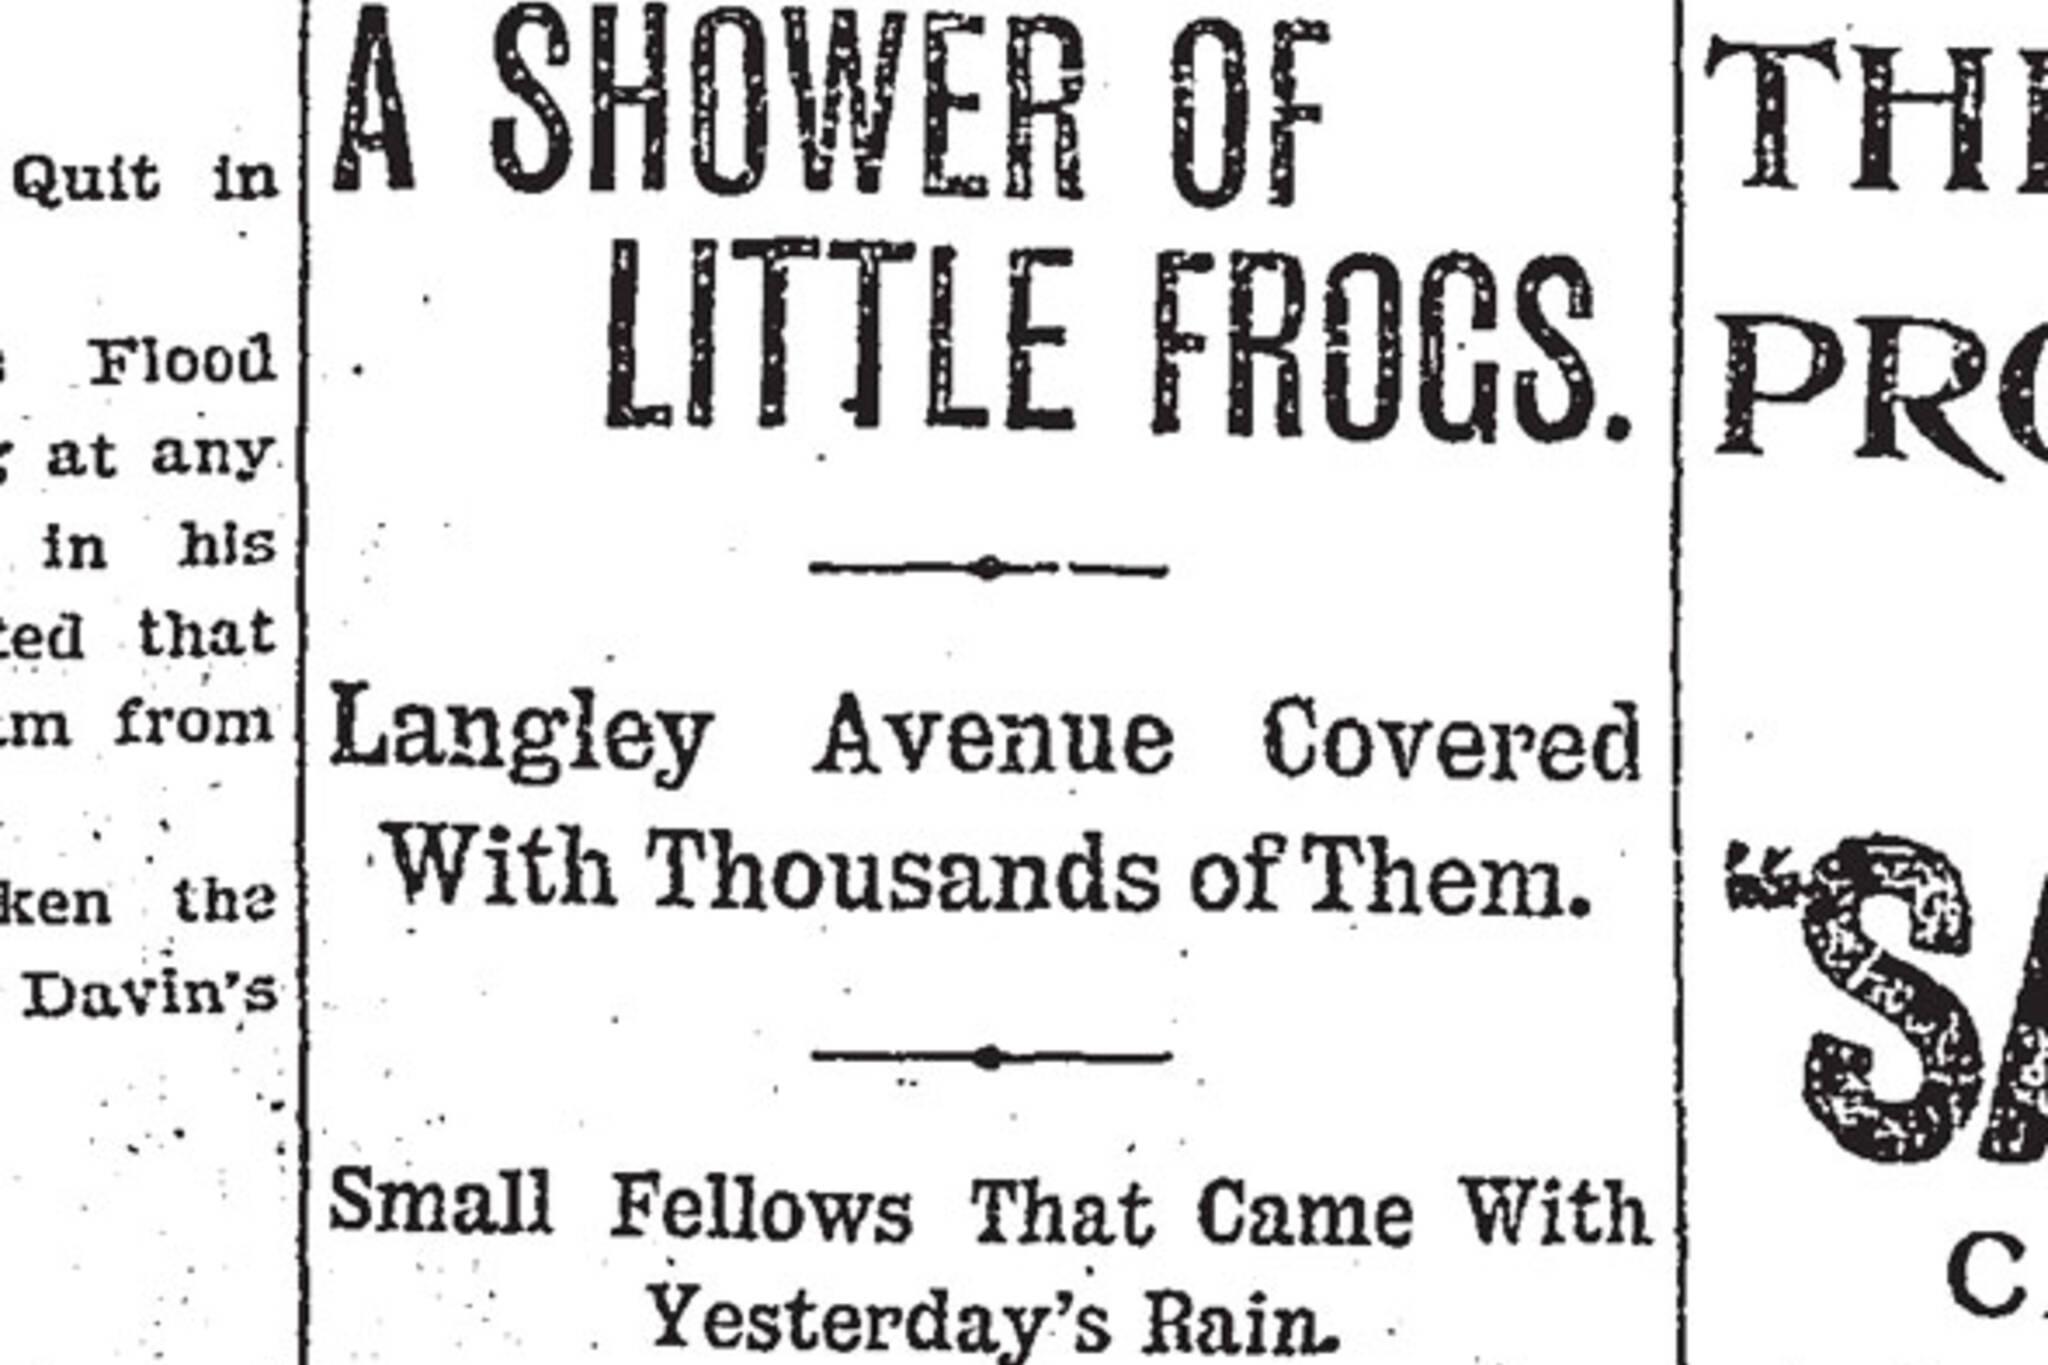 toronto raining frogs